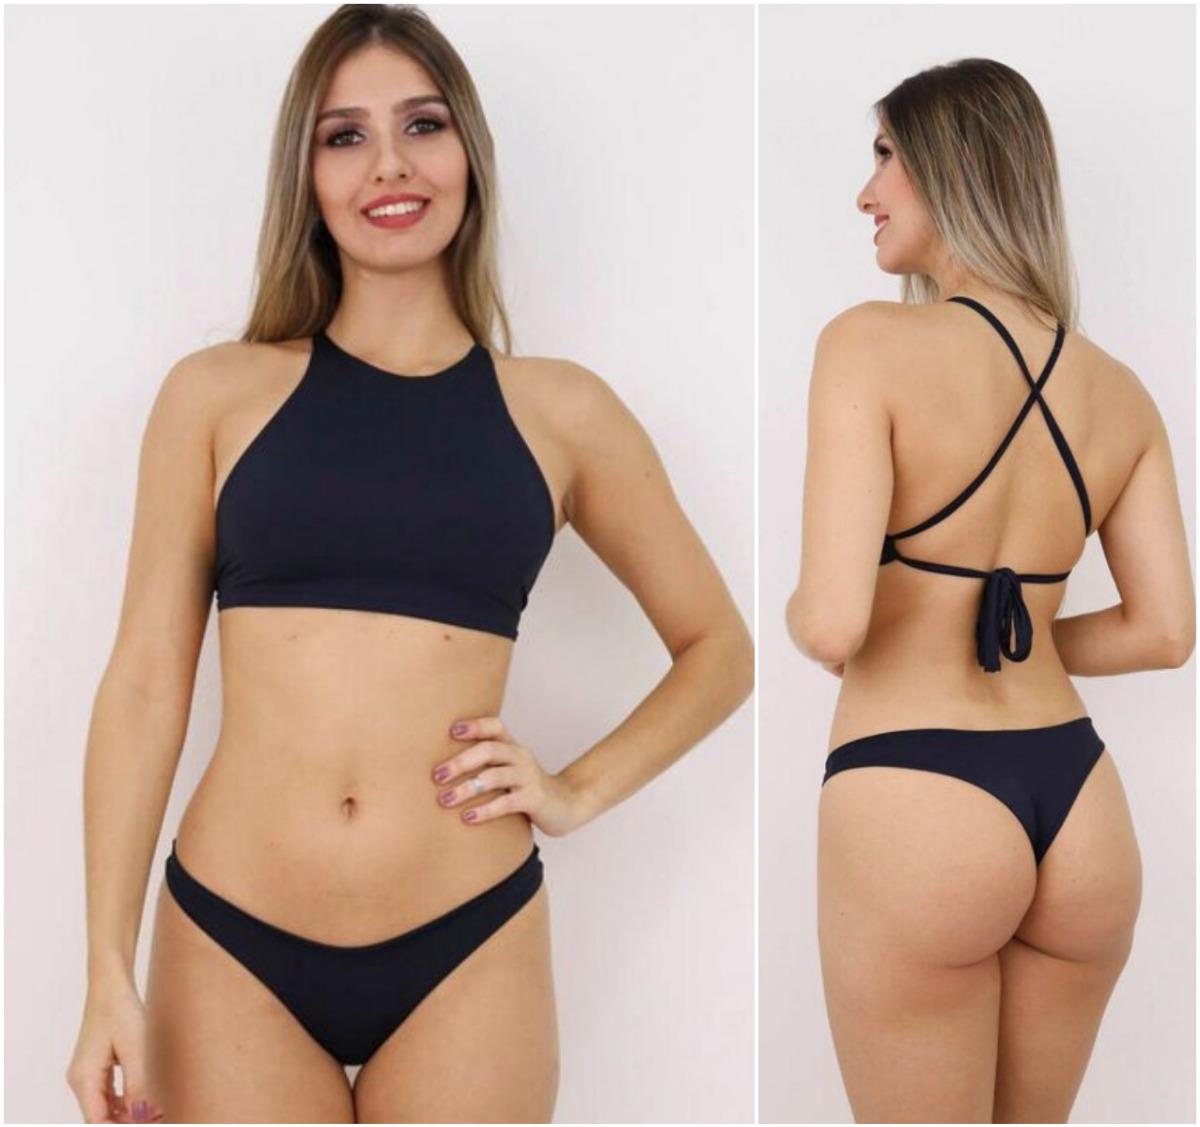 2019 Bruna Marquezine naked (58 photos), Pussy, Bikini, Selfie, in bikini 2017